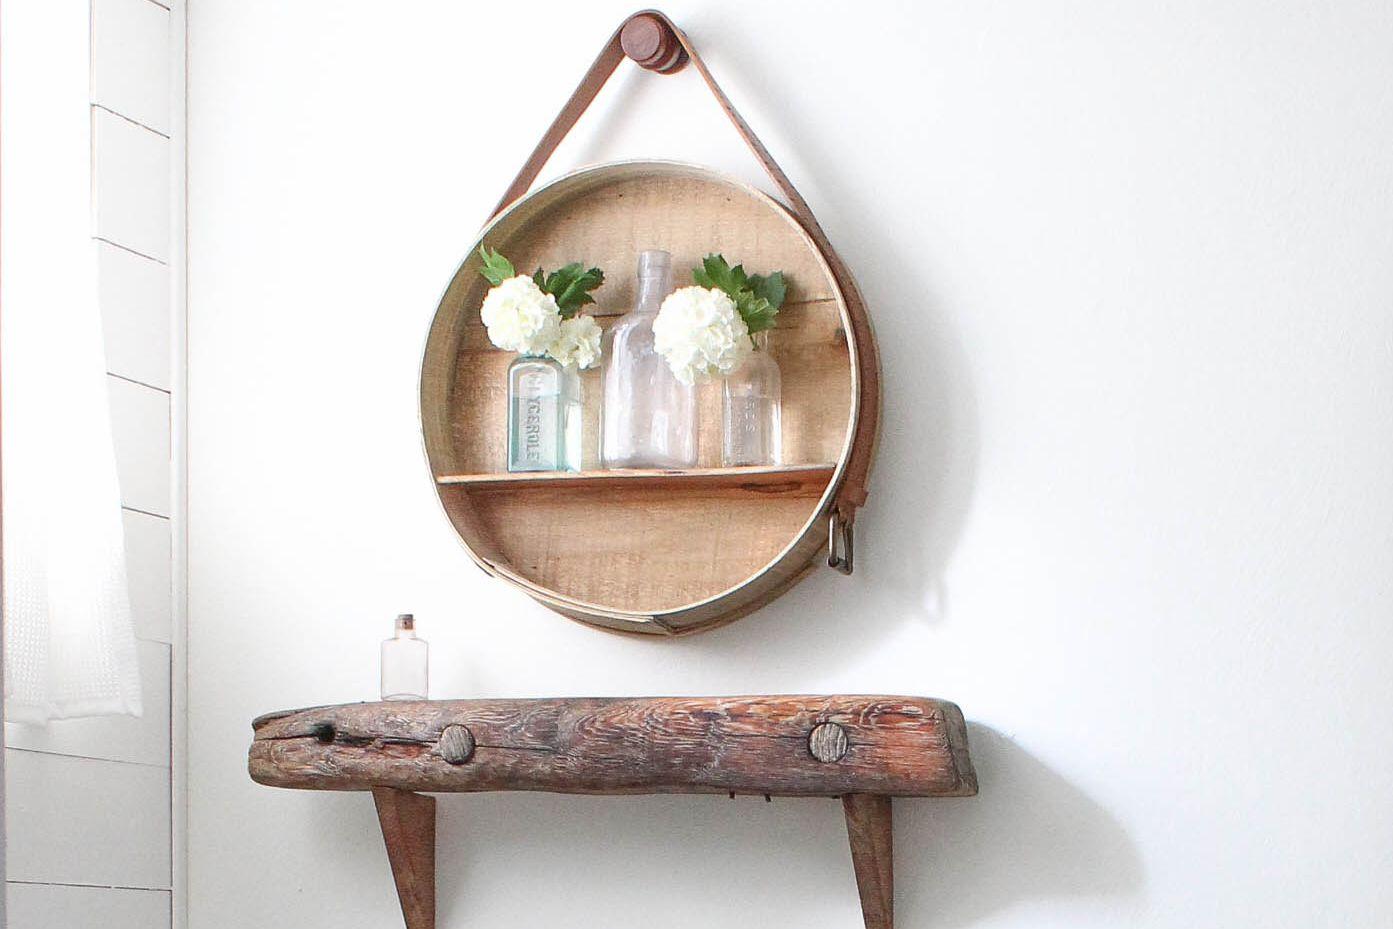 Circle shelf with bottles